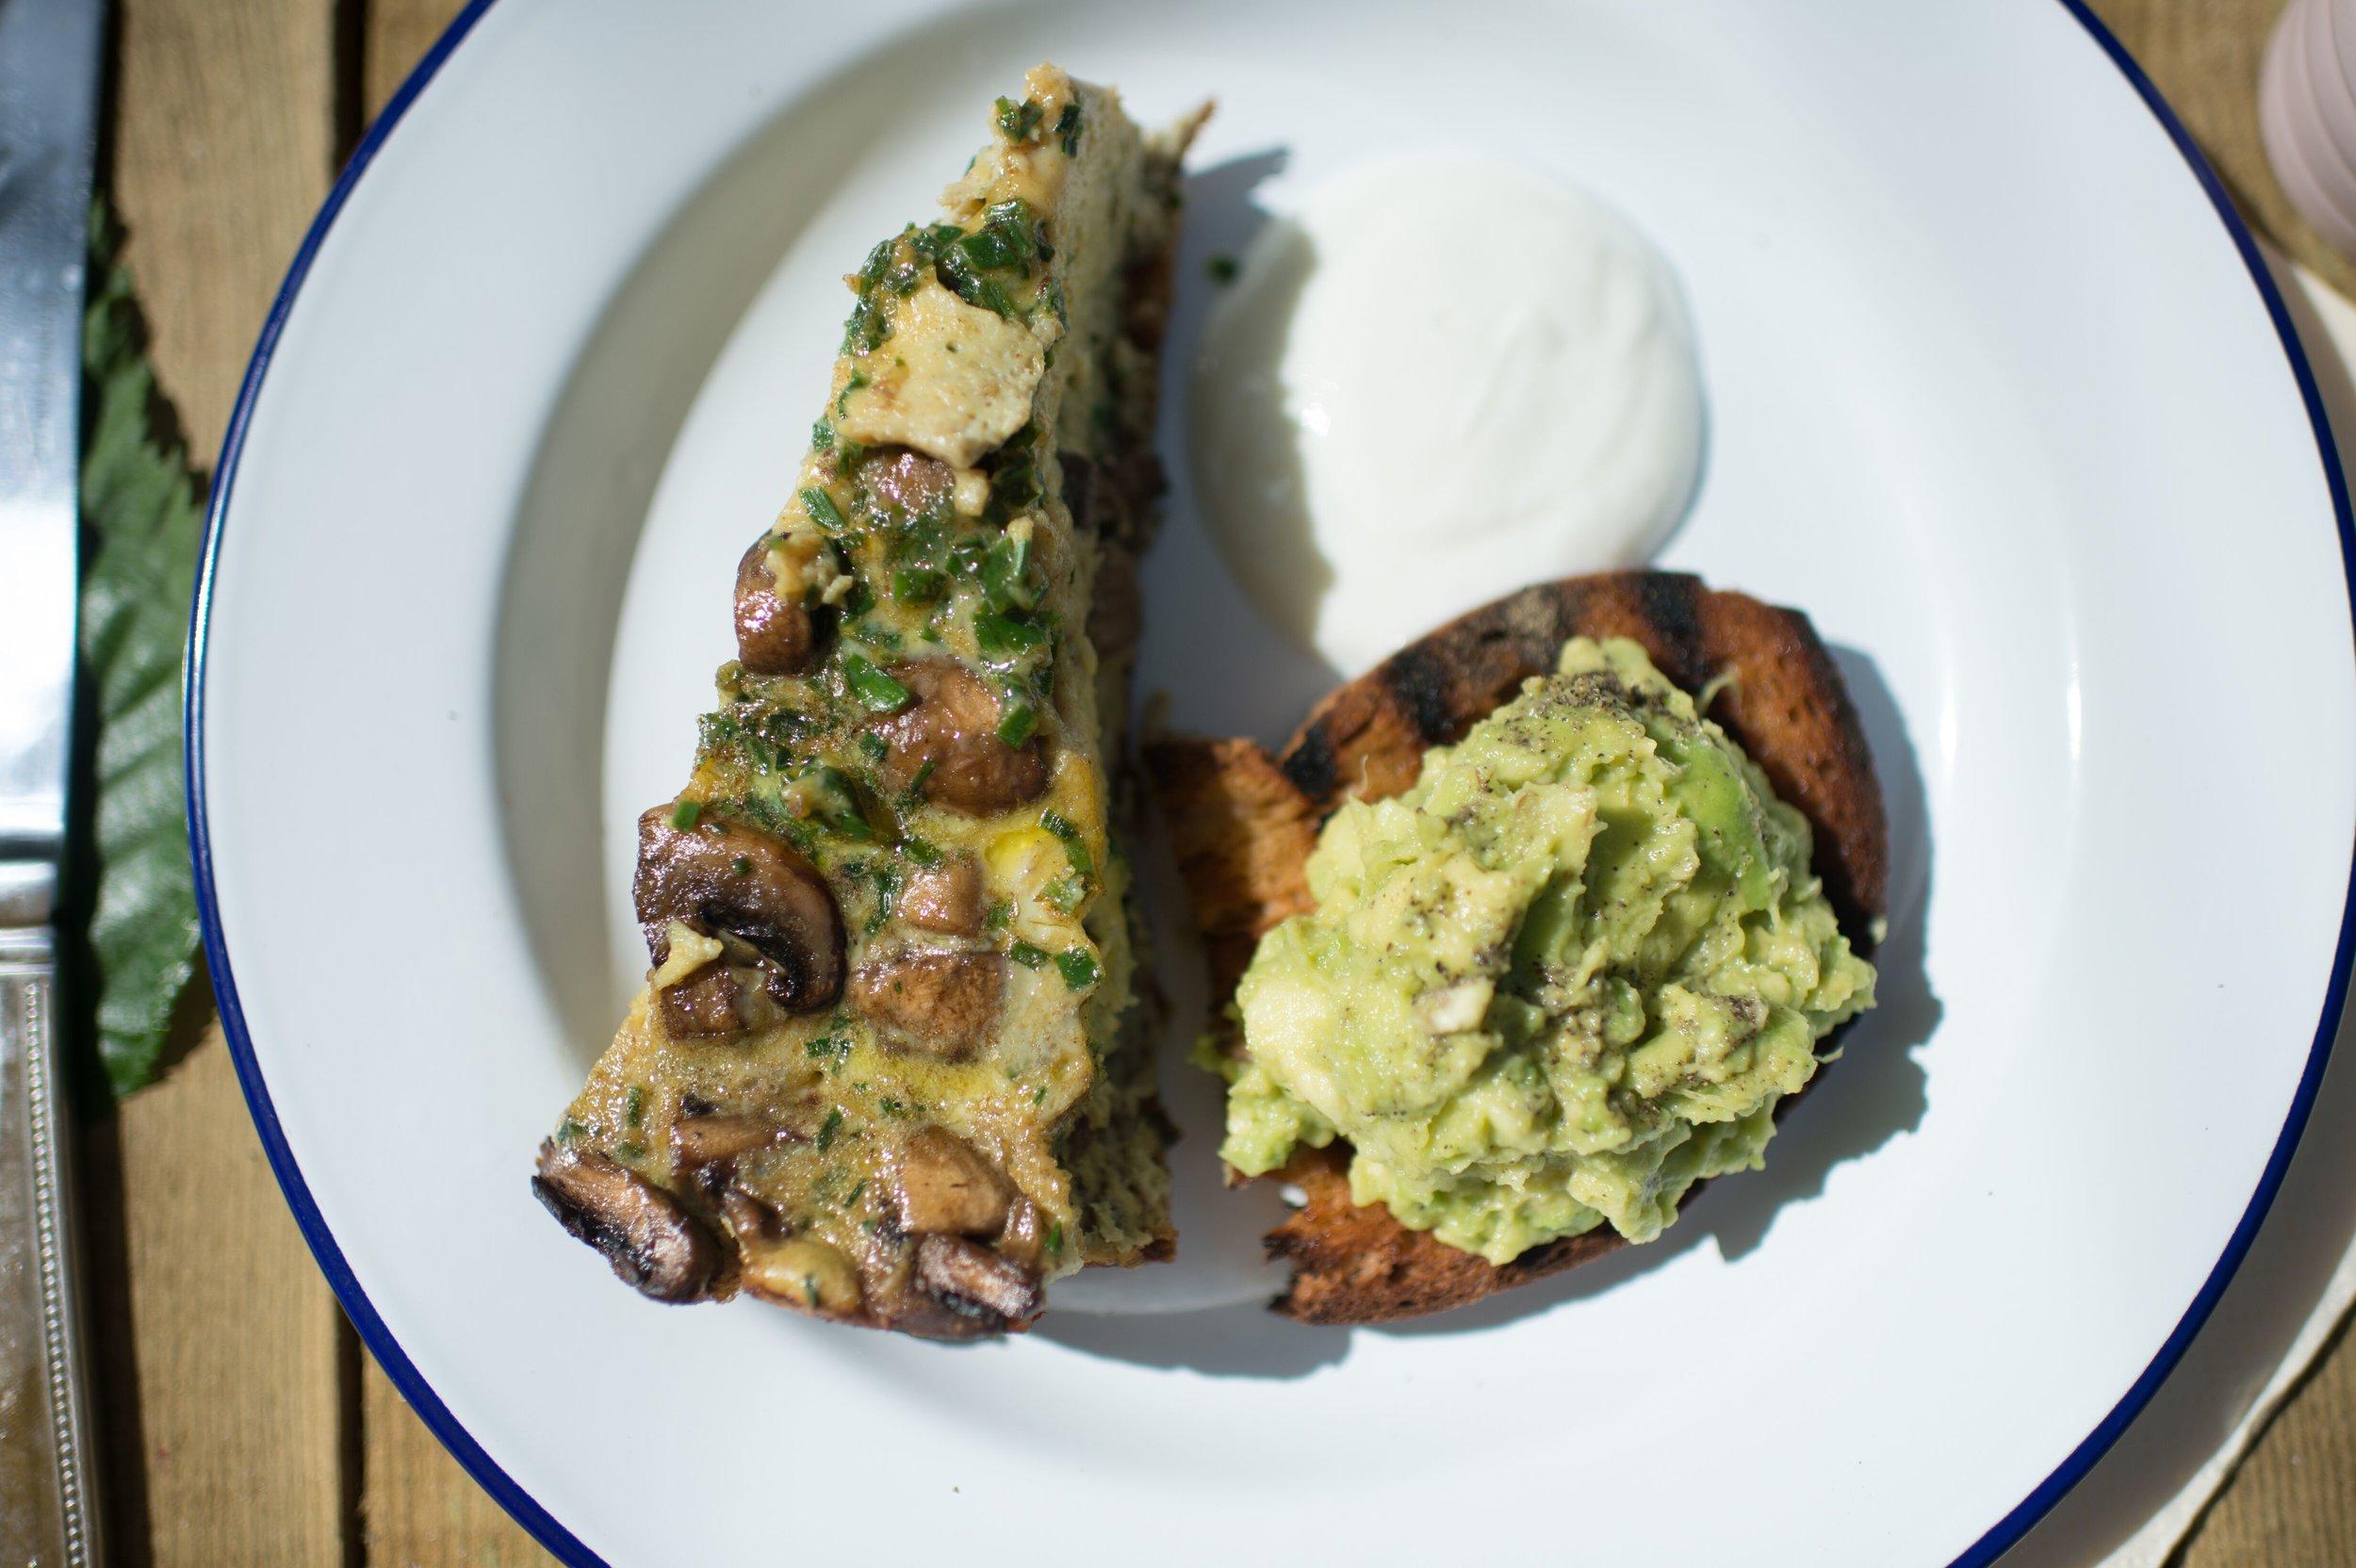 Mushroom and herb frittata with garam masala, mashed avocado